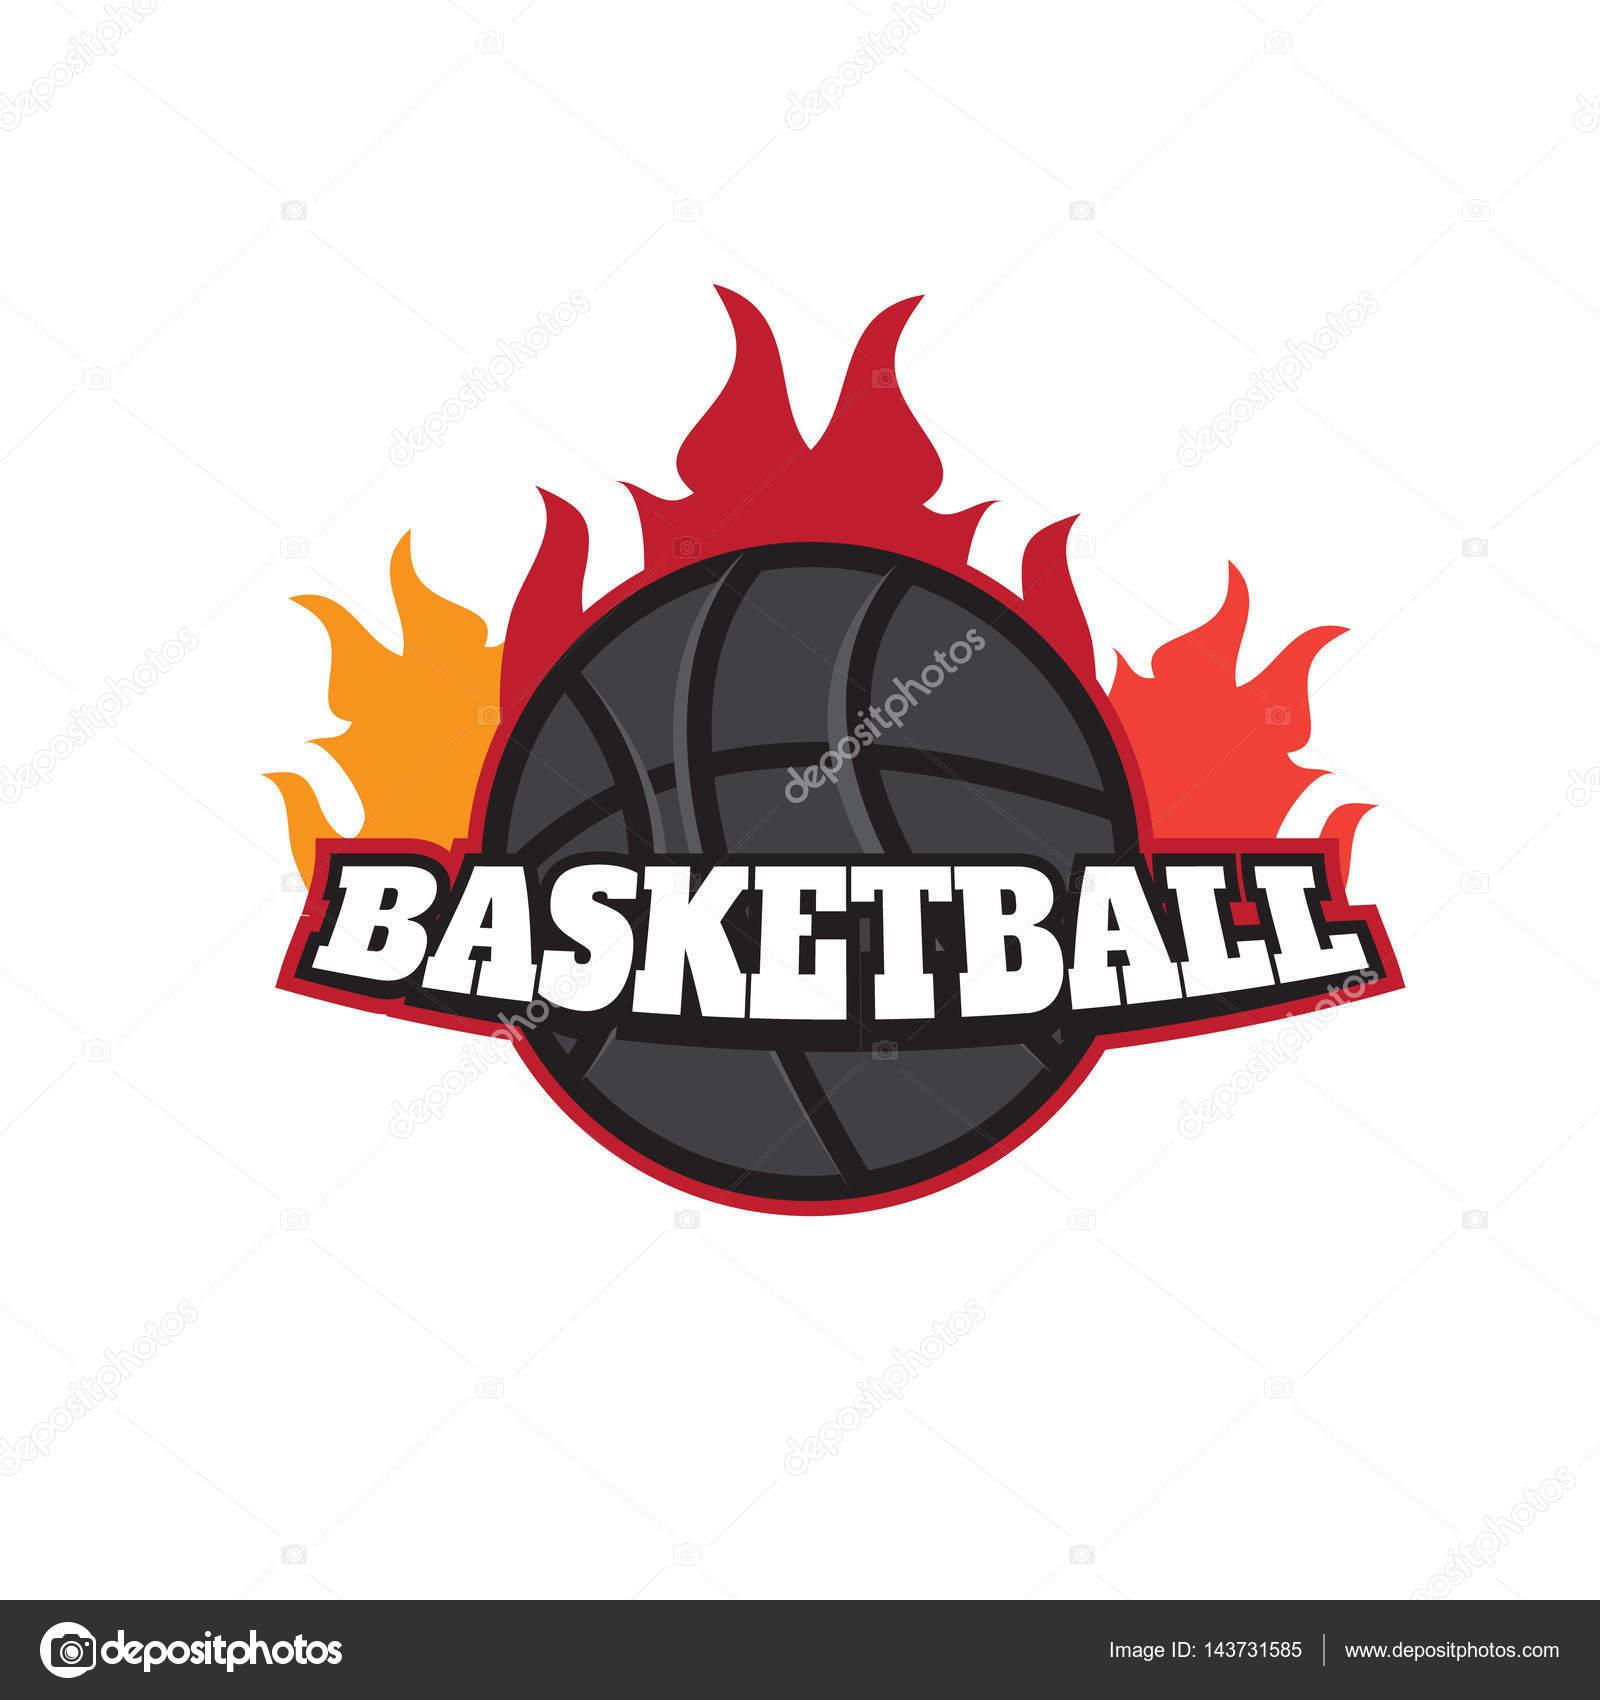 Old Fashioned Basketball Flyer Beispiel Inspiration - FORTSETZUNG ...